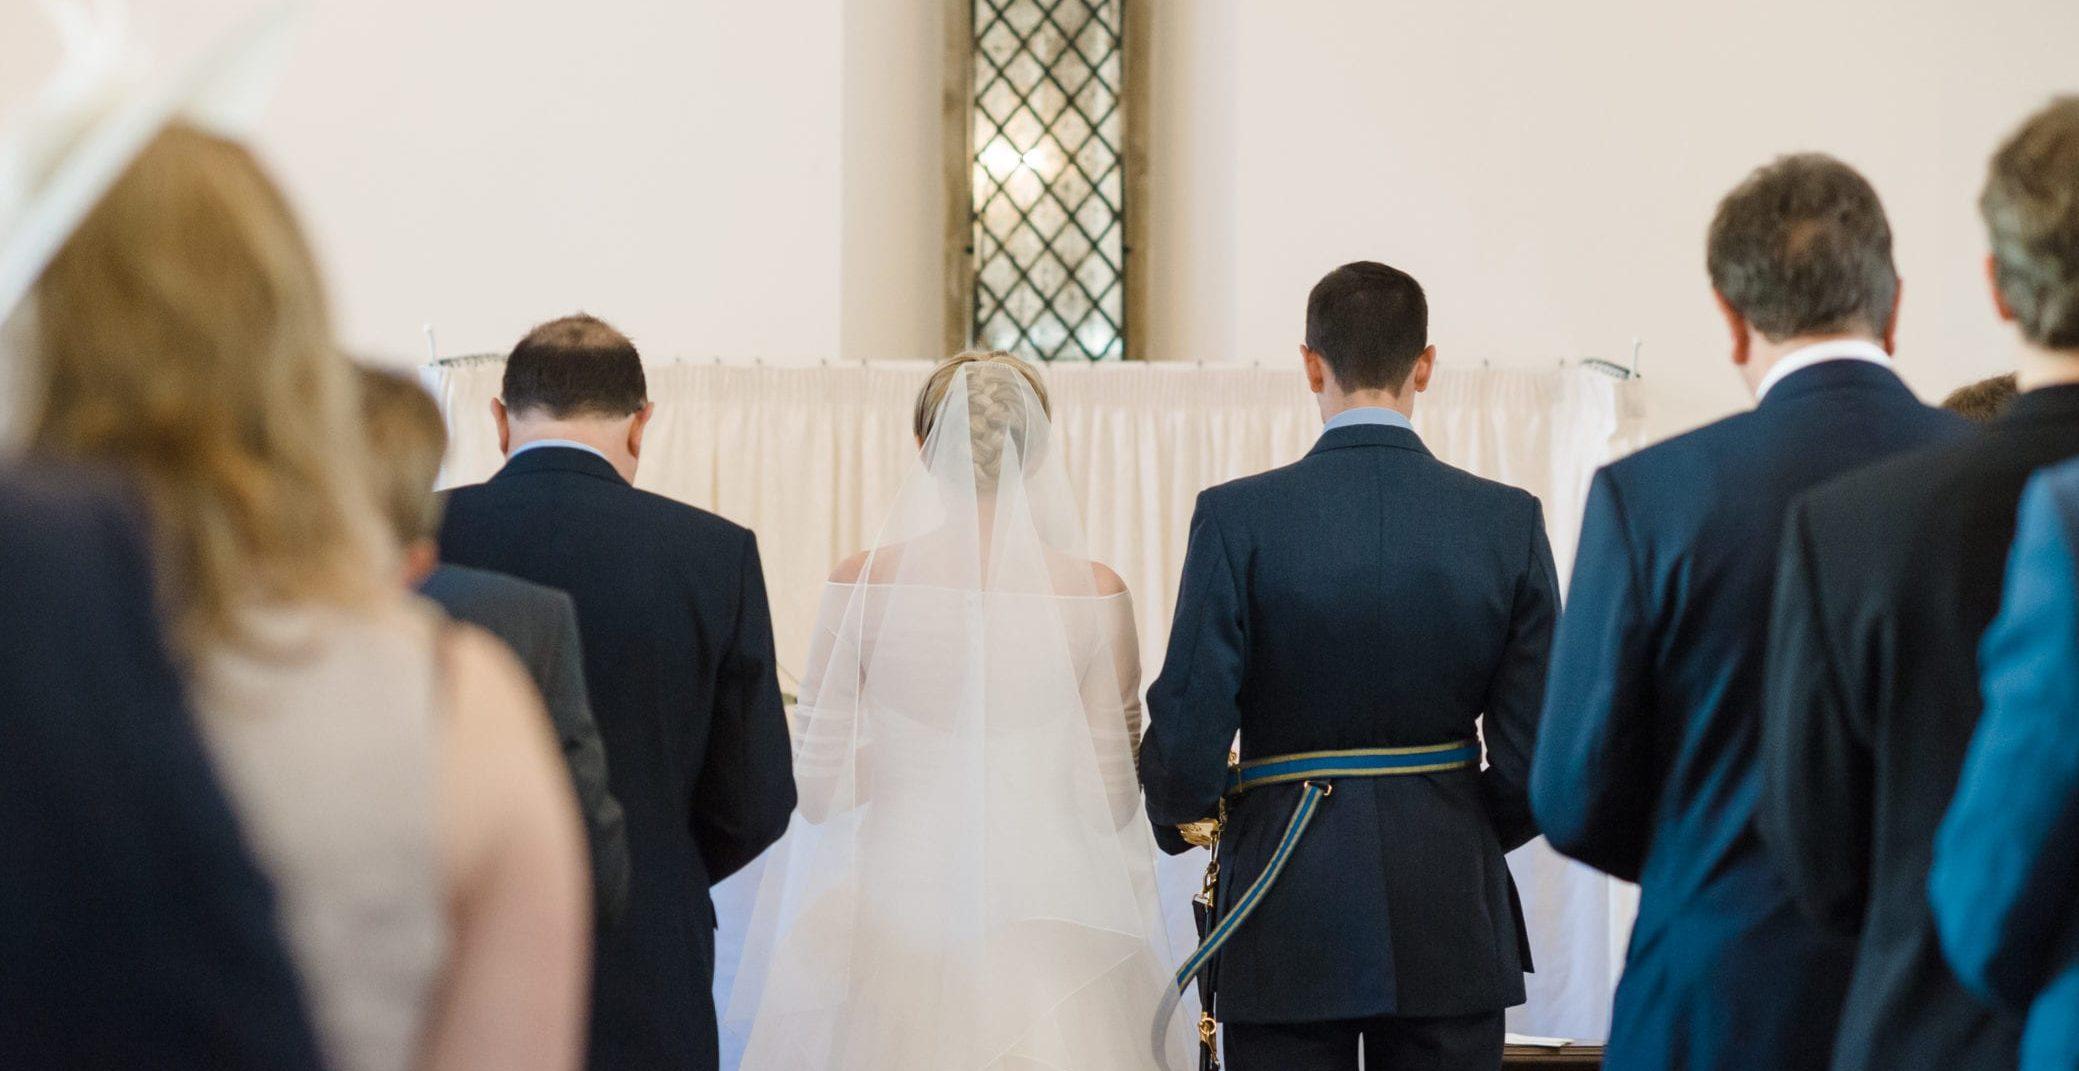 Church of England wedding ceremony at Farnham Castle